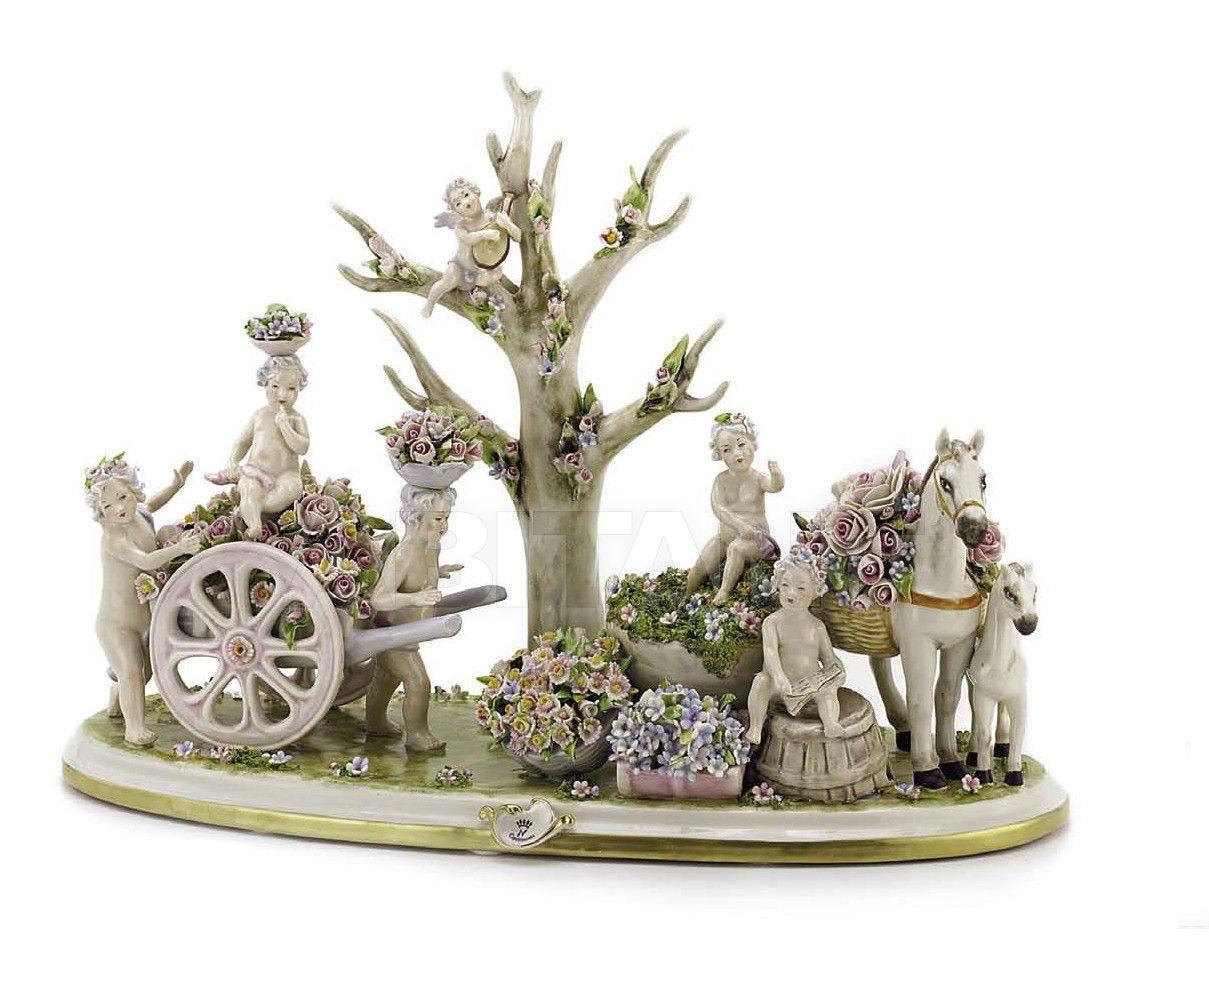 Купить Статуэтка FLOWERED GARDEN Villari Capodimonte T.01738-002